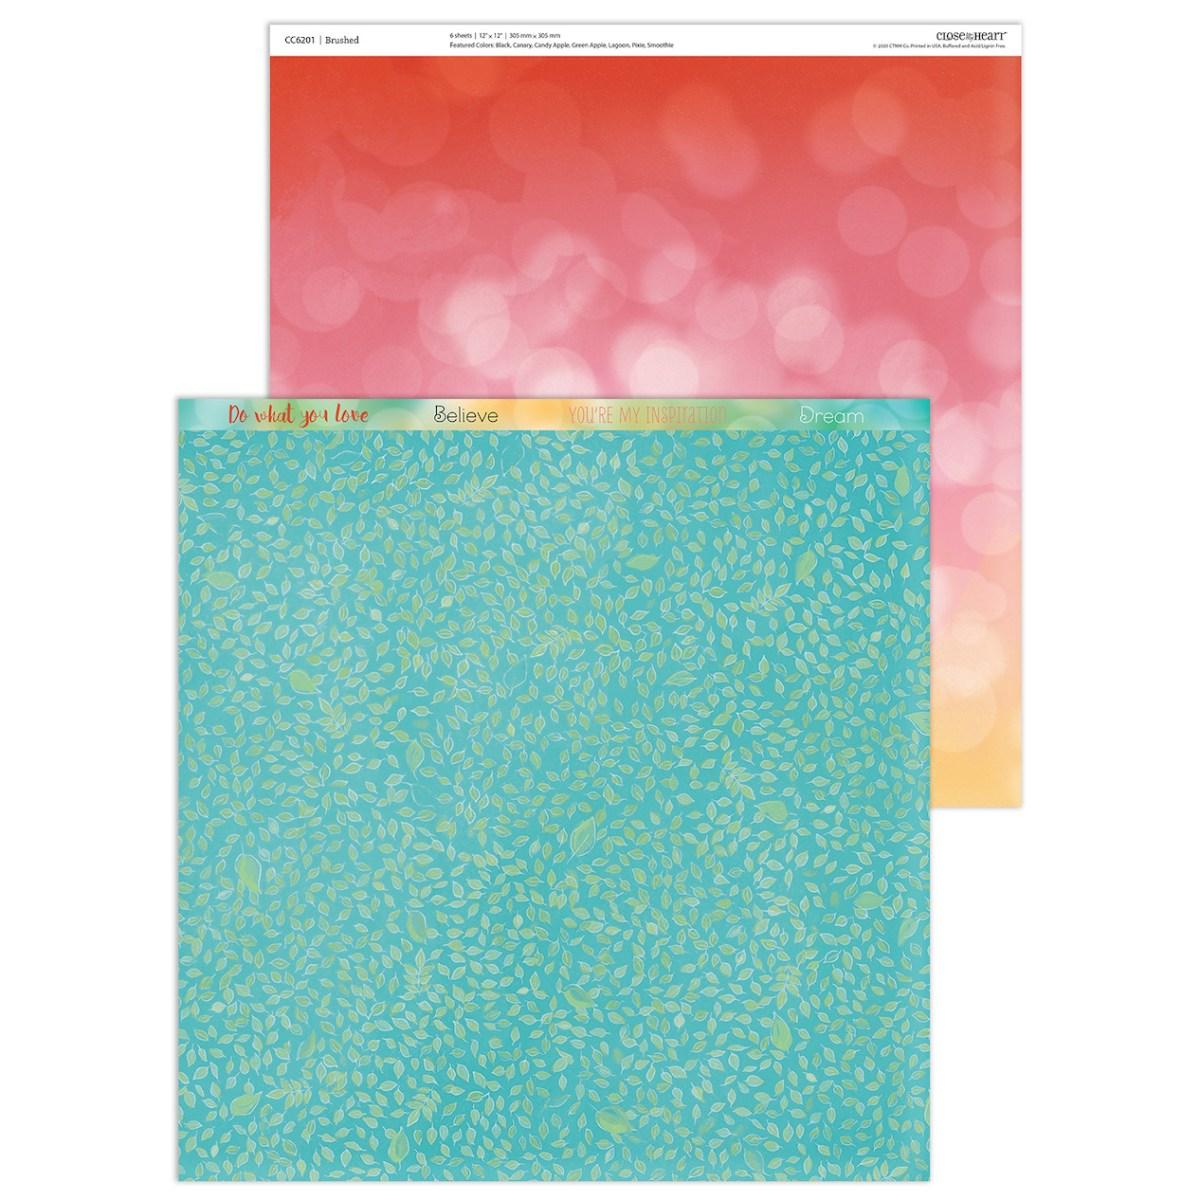 Brushed Paper Collection #closetomyheart #ctmh #ctmhbrushed #bringbackmypack #scrapbooking #cardmaking #papercrafting #crop #abuddingfriendship #yourownkindofwonderful #myacrylix #stamping